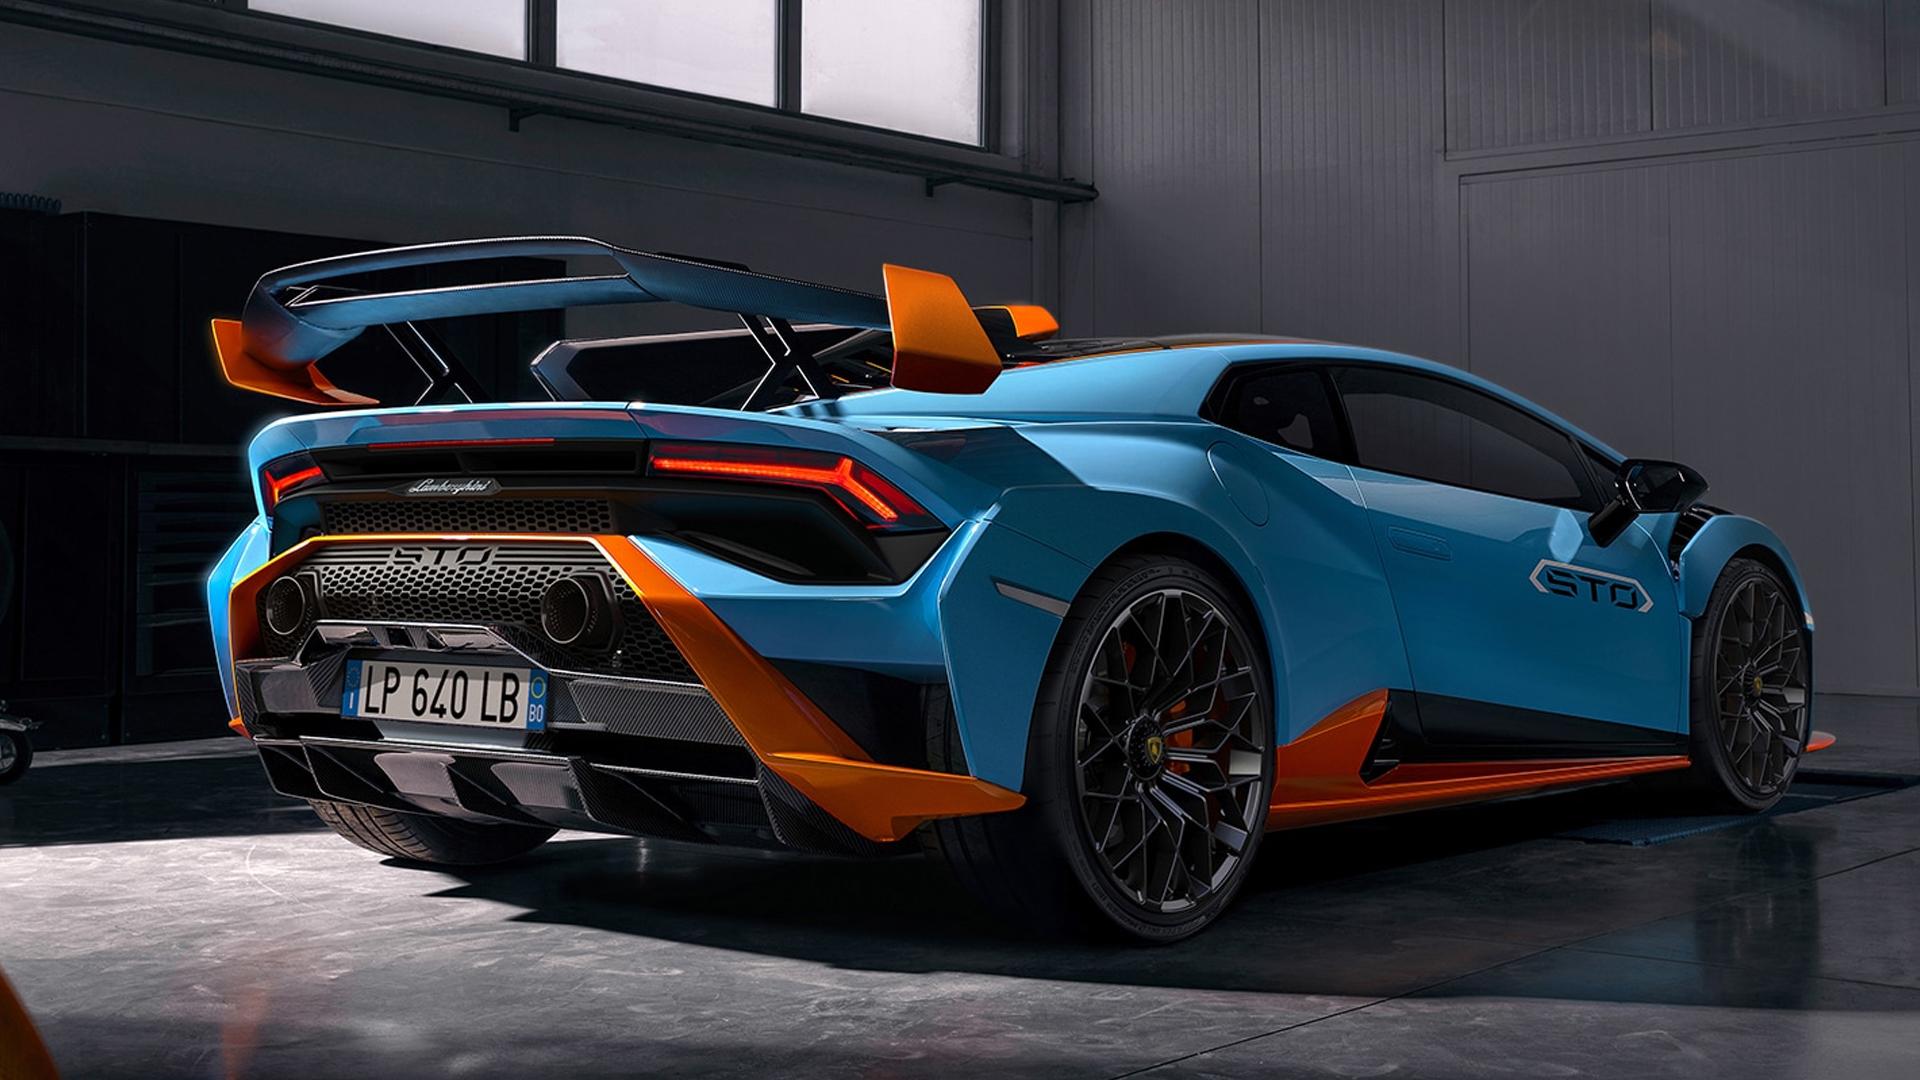 Lamborghini Huracan 2021 STO Exterior